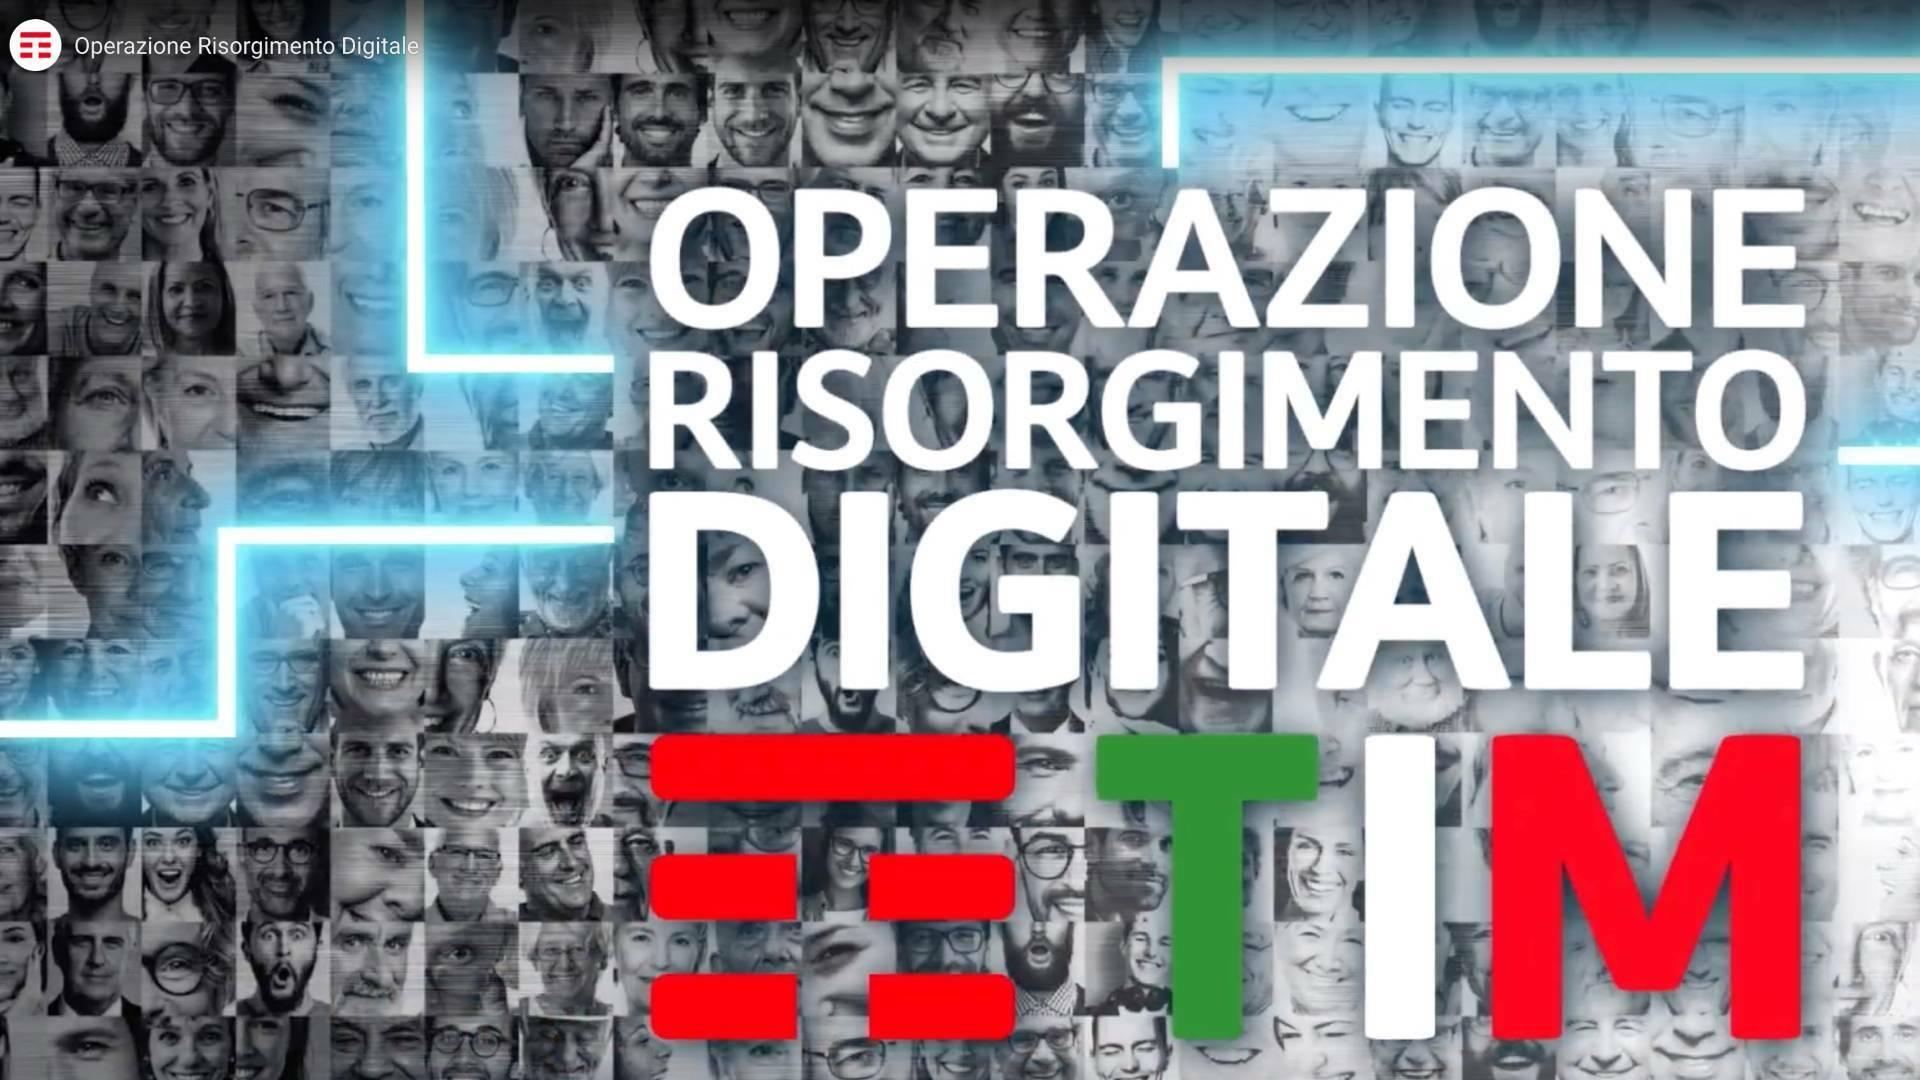 TIM Operazione Risorgimento Digitale